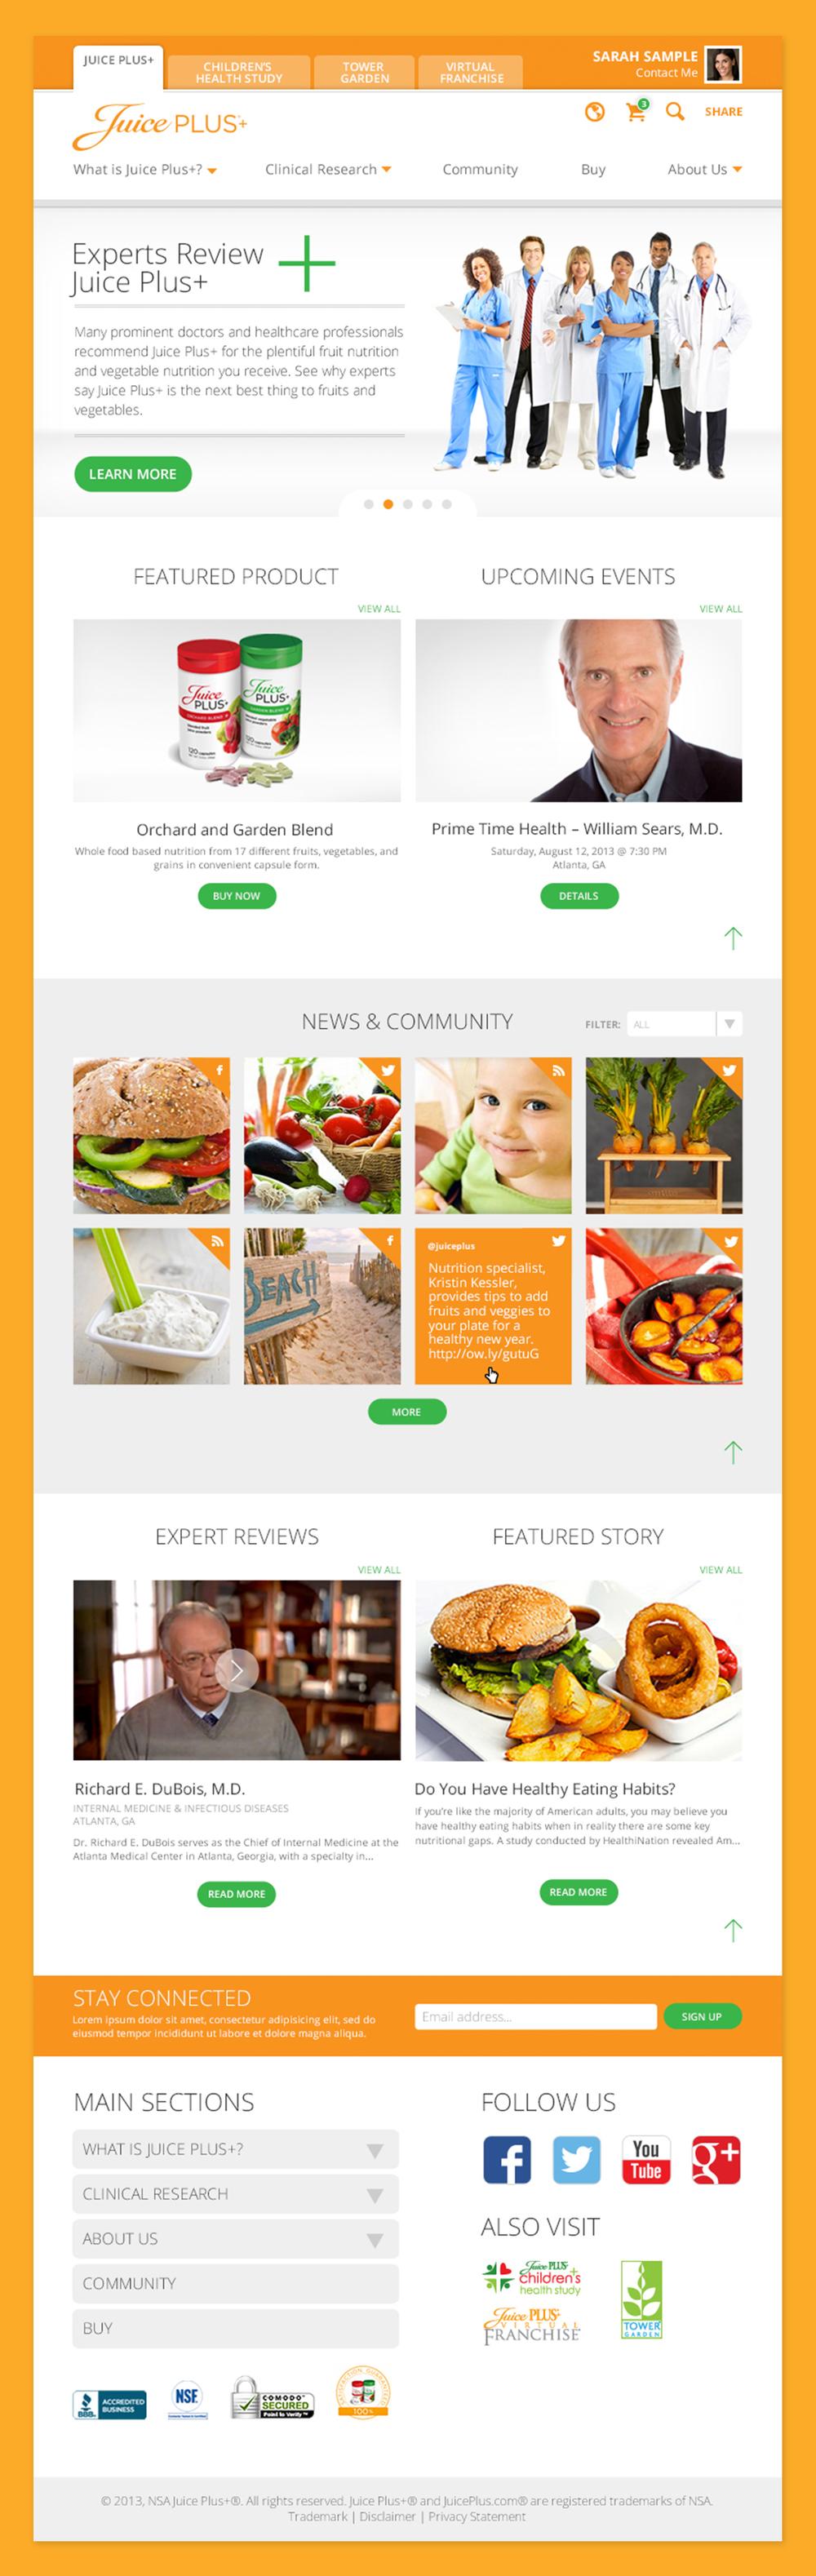 New Page 5 >> Juice Plus+ Website — Edelman Creative Work